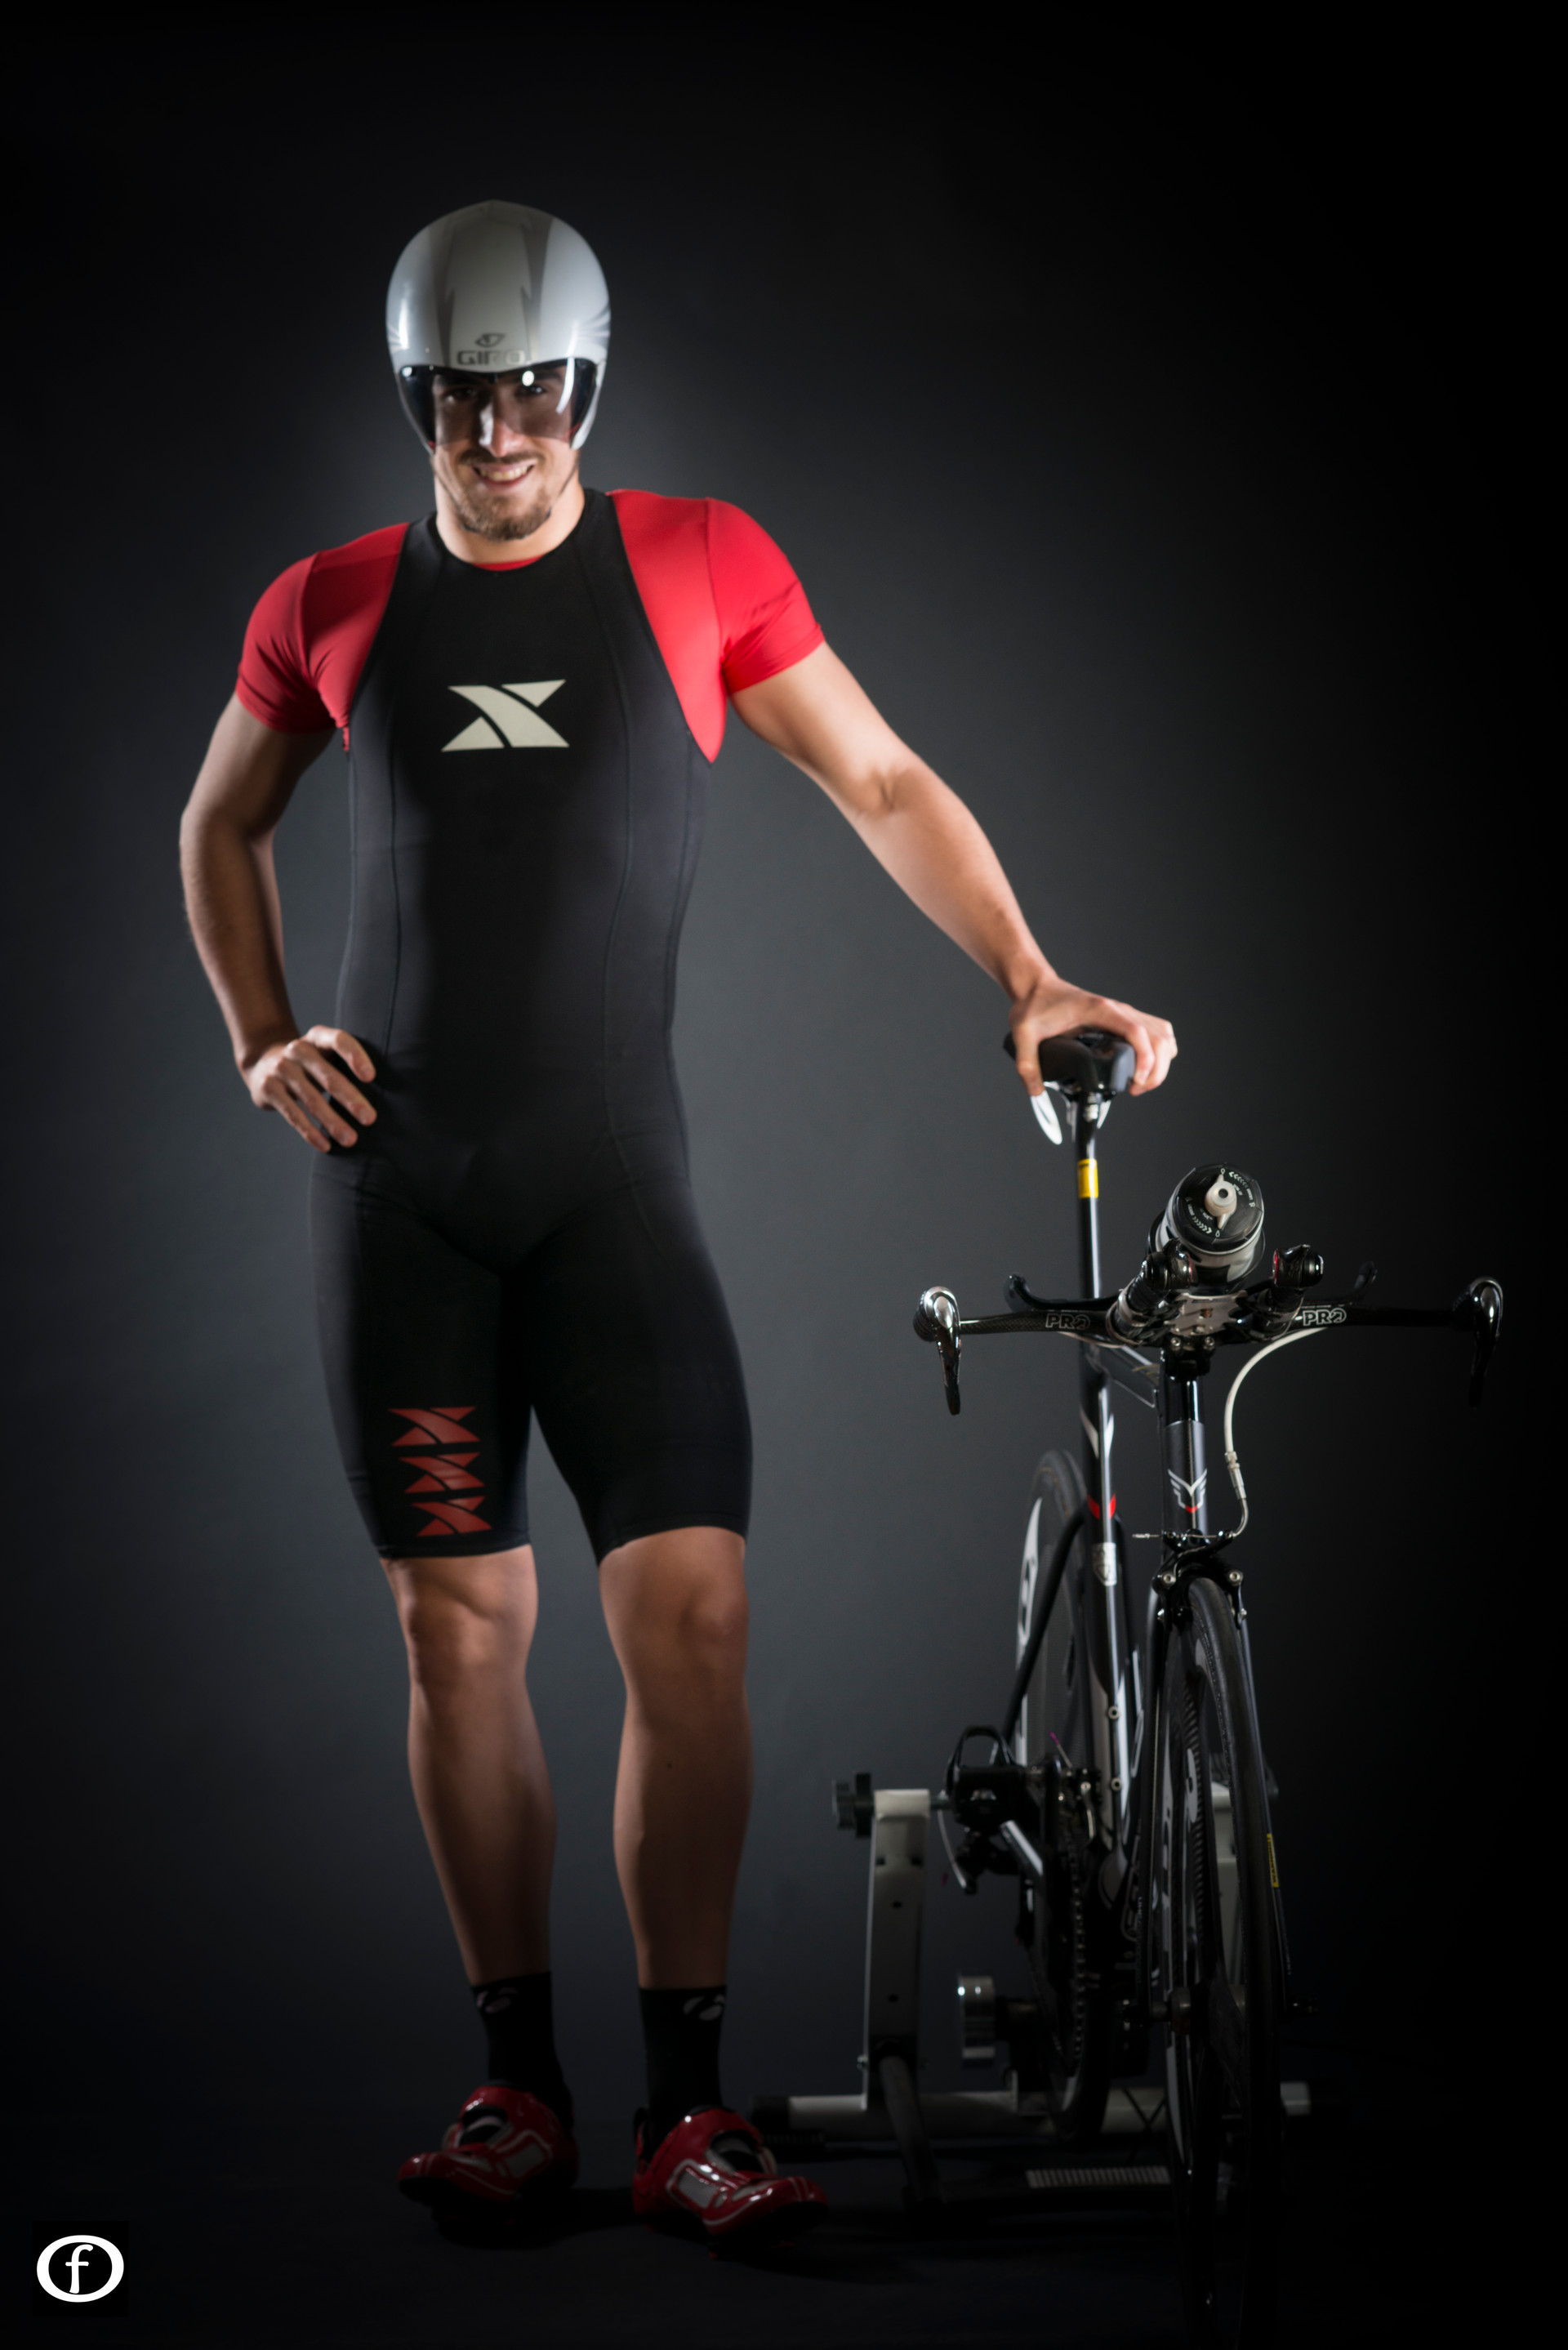 Triatleta Felipe Aguayo-9233.jpg